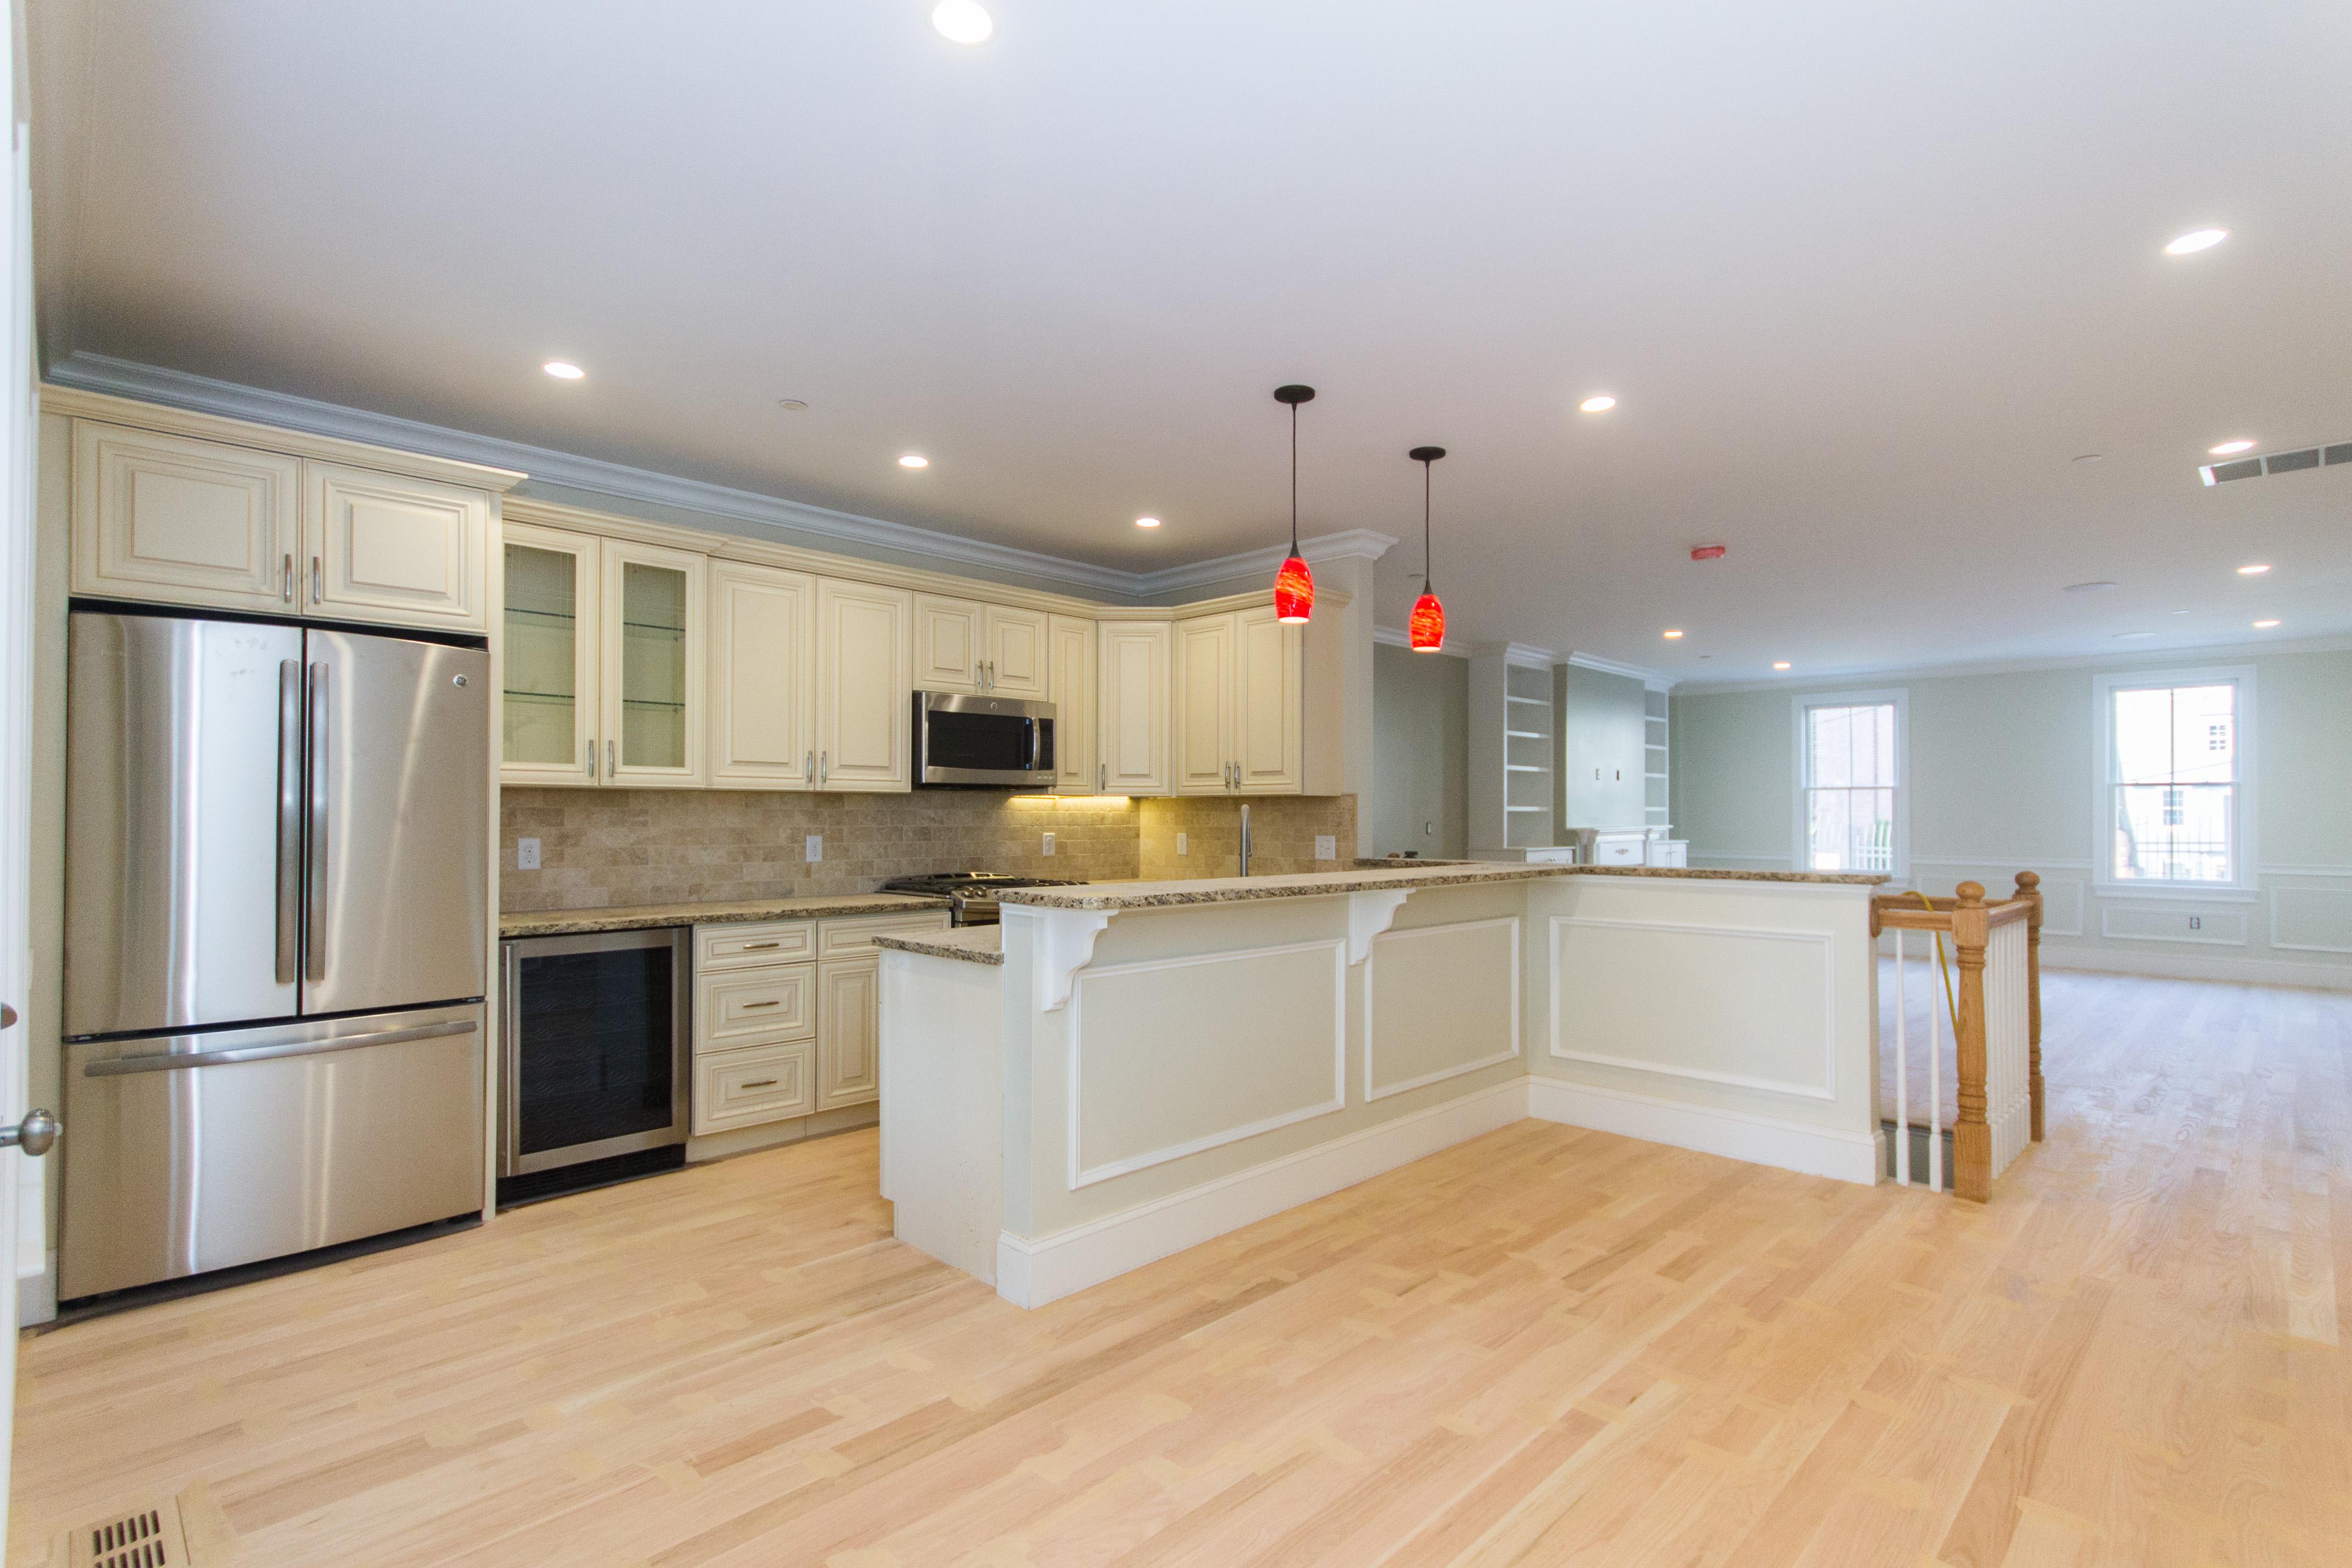 Property For Sale at 21 Salem Street - Unit 1